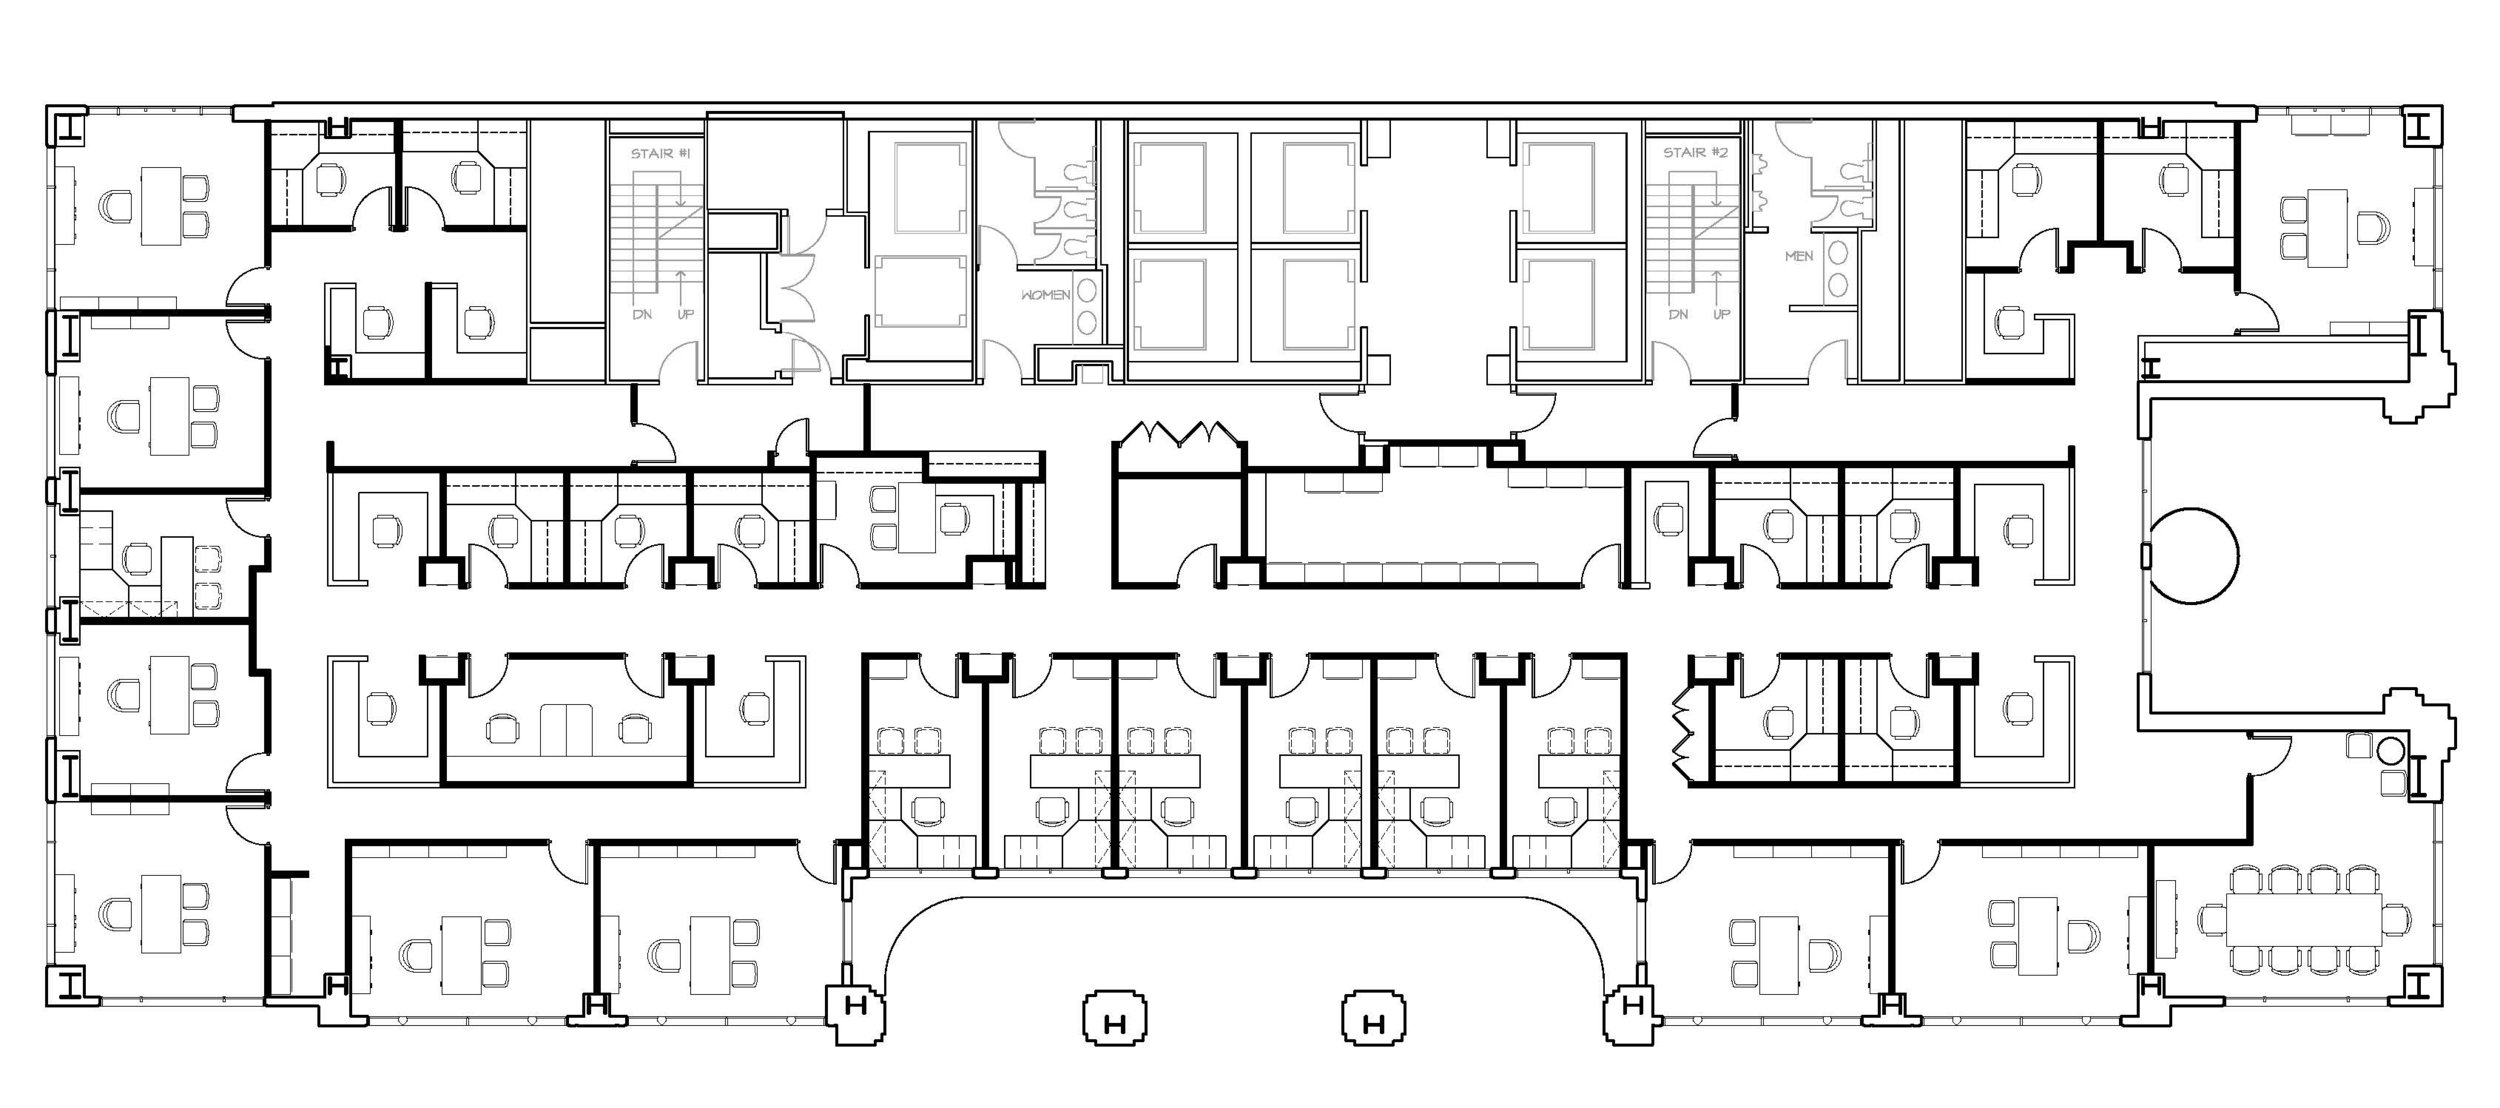 Litchfield Cavo 01.01 - Second Floor Plan.jpg